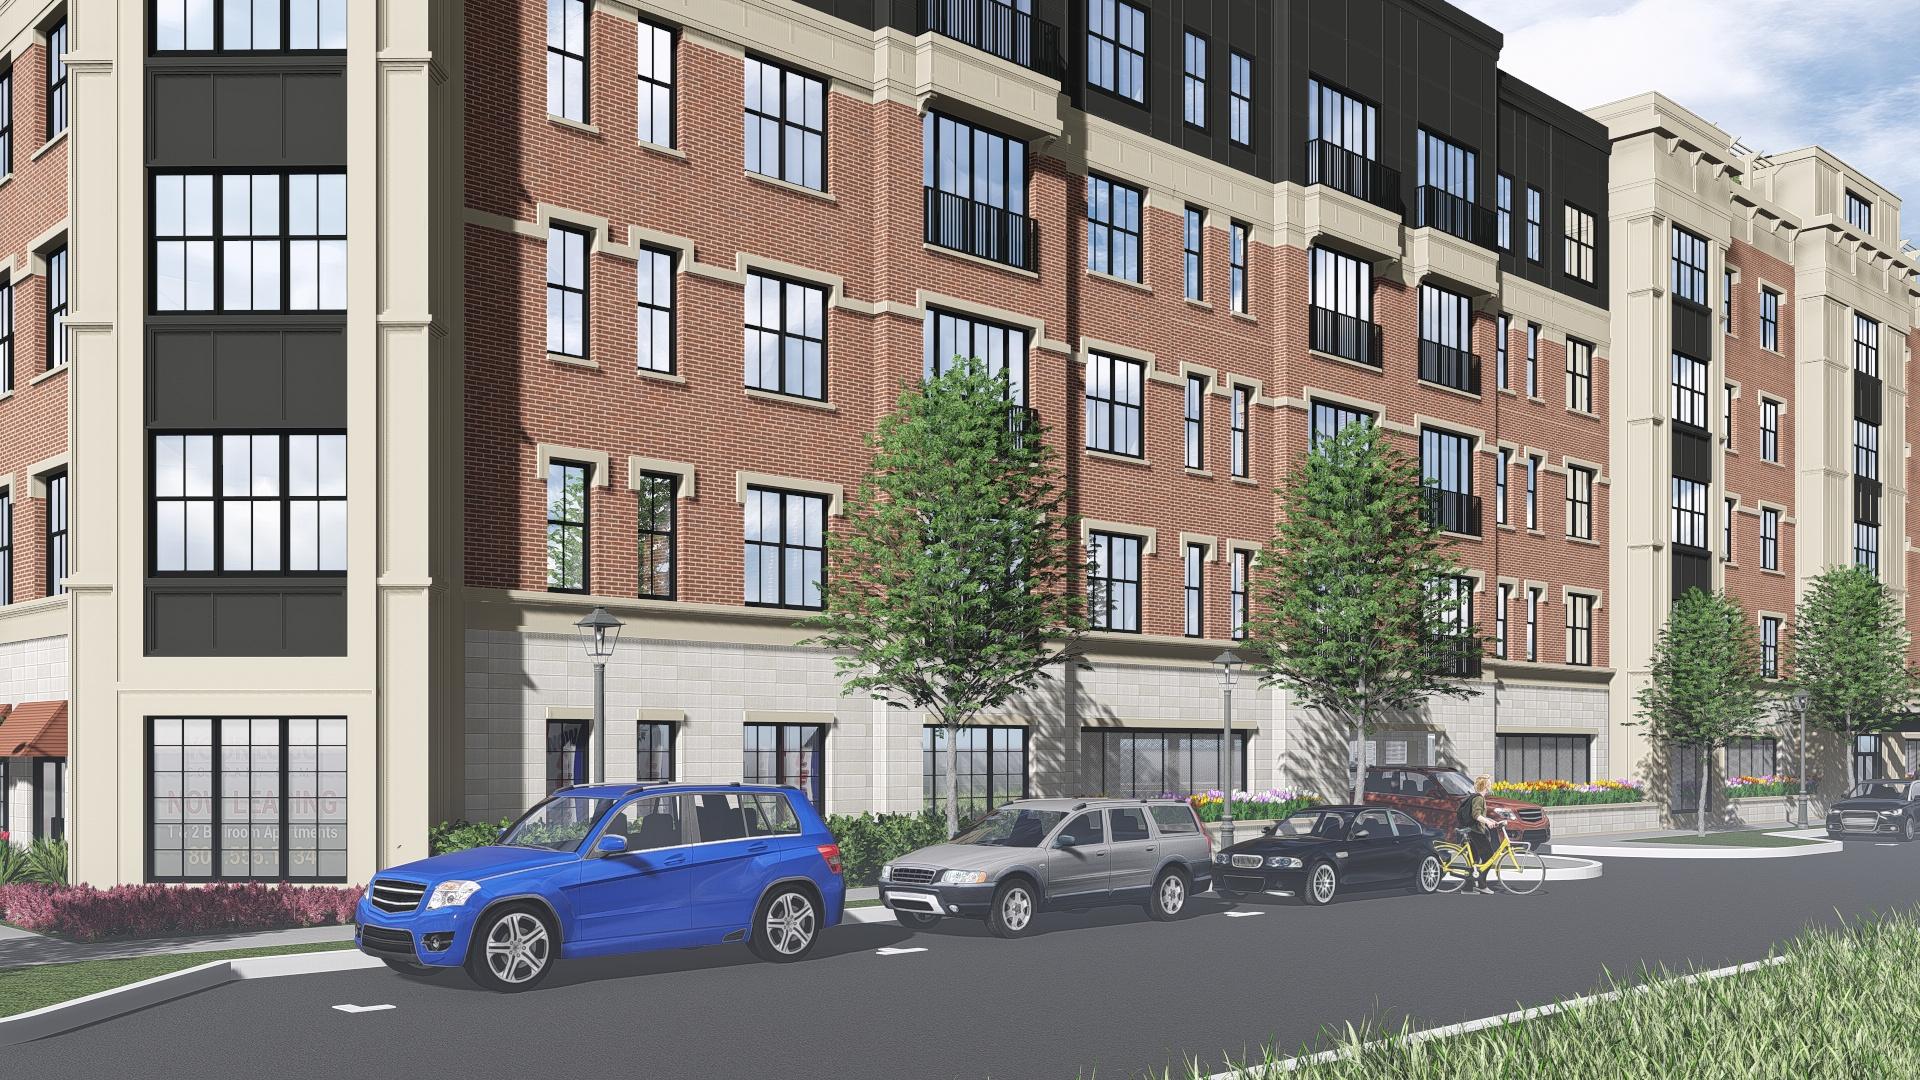 2015.12.01_Oak Street Apartments_V05.jpg